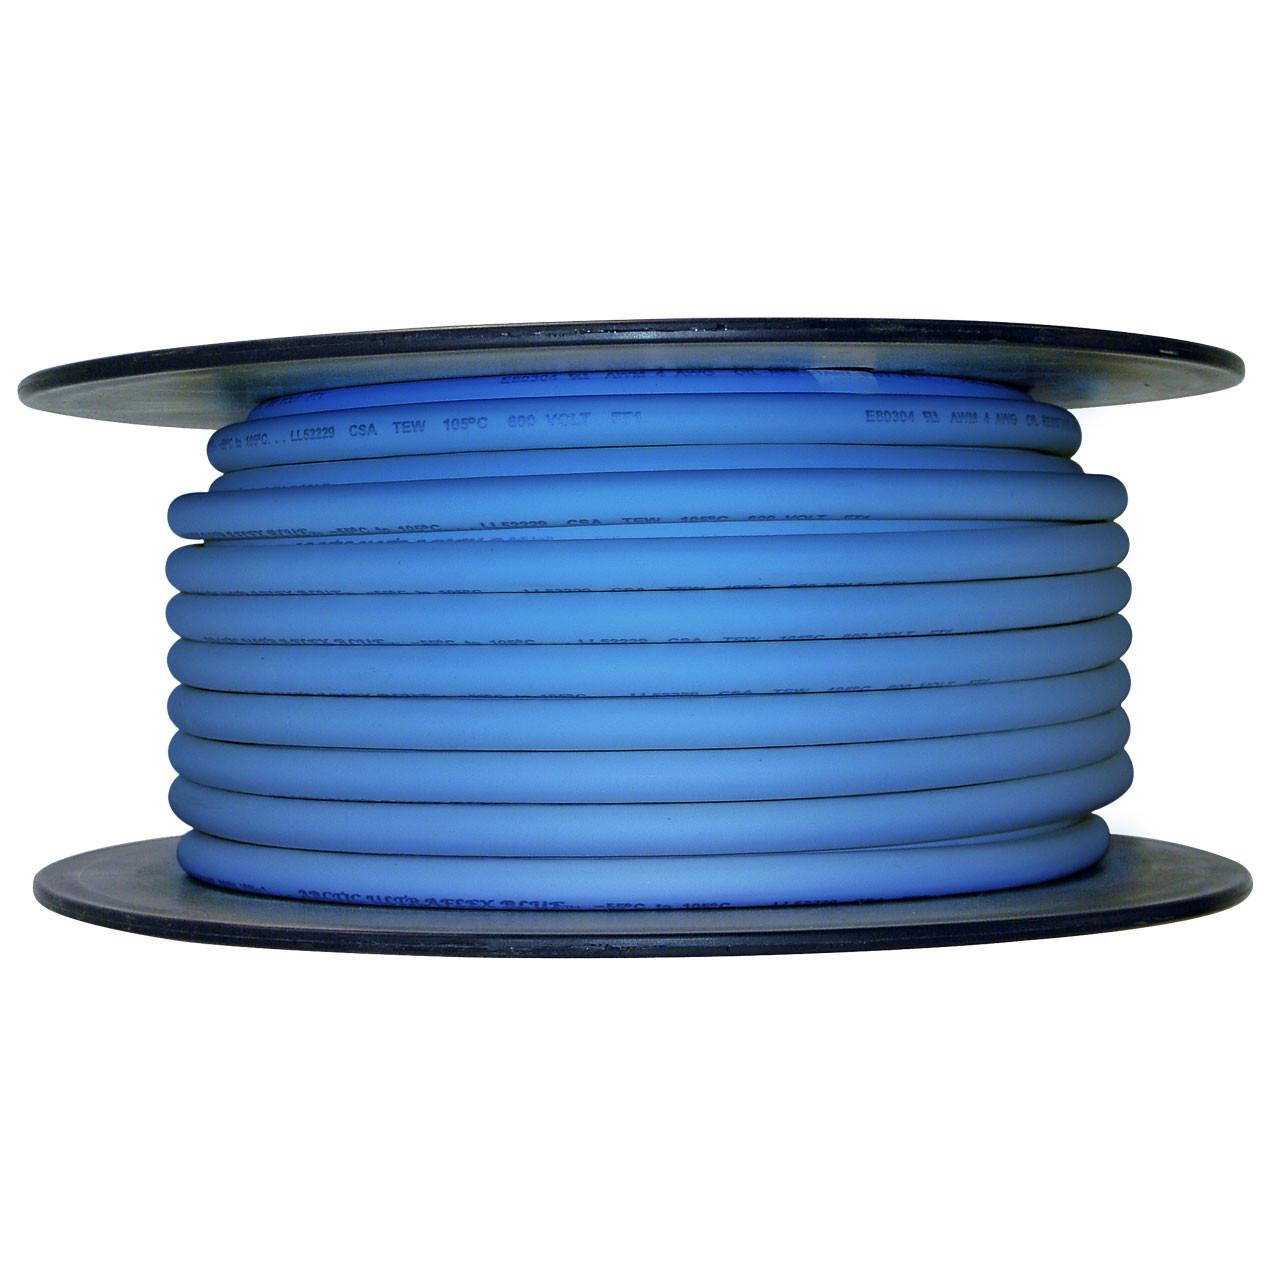 ARCTIC ULTRAFLEX 4GA BLUE 100 FOOT ROLL